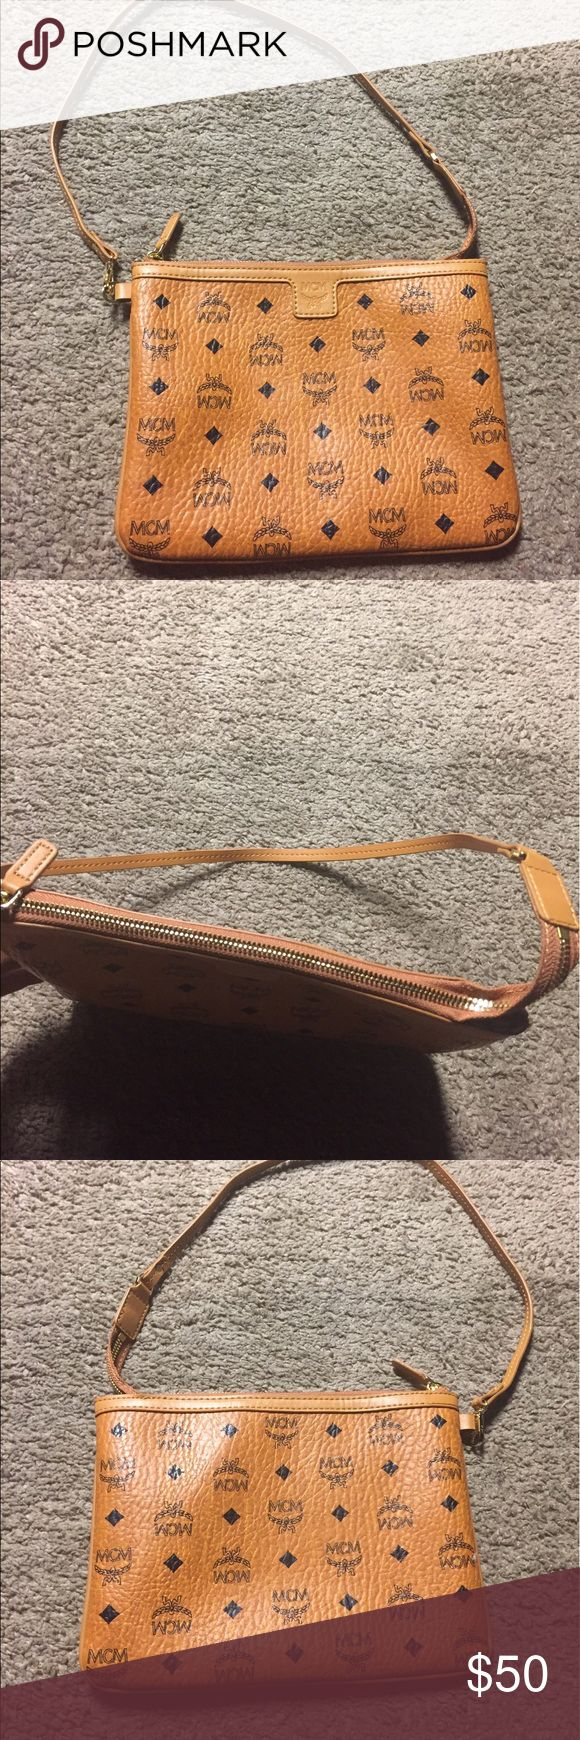 Mcm Mini bag Mcm Mini bag ❌PRICE REFLECTS❌ MCM Bags Clutches & Wristlets